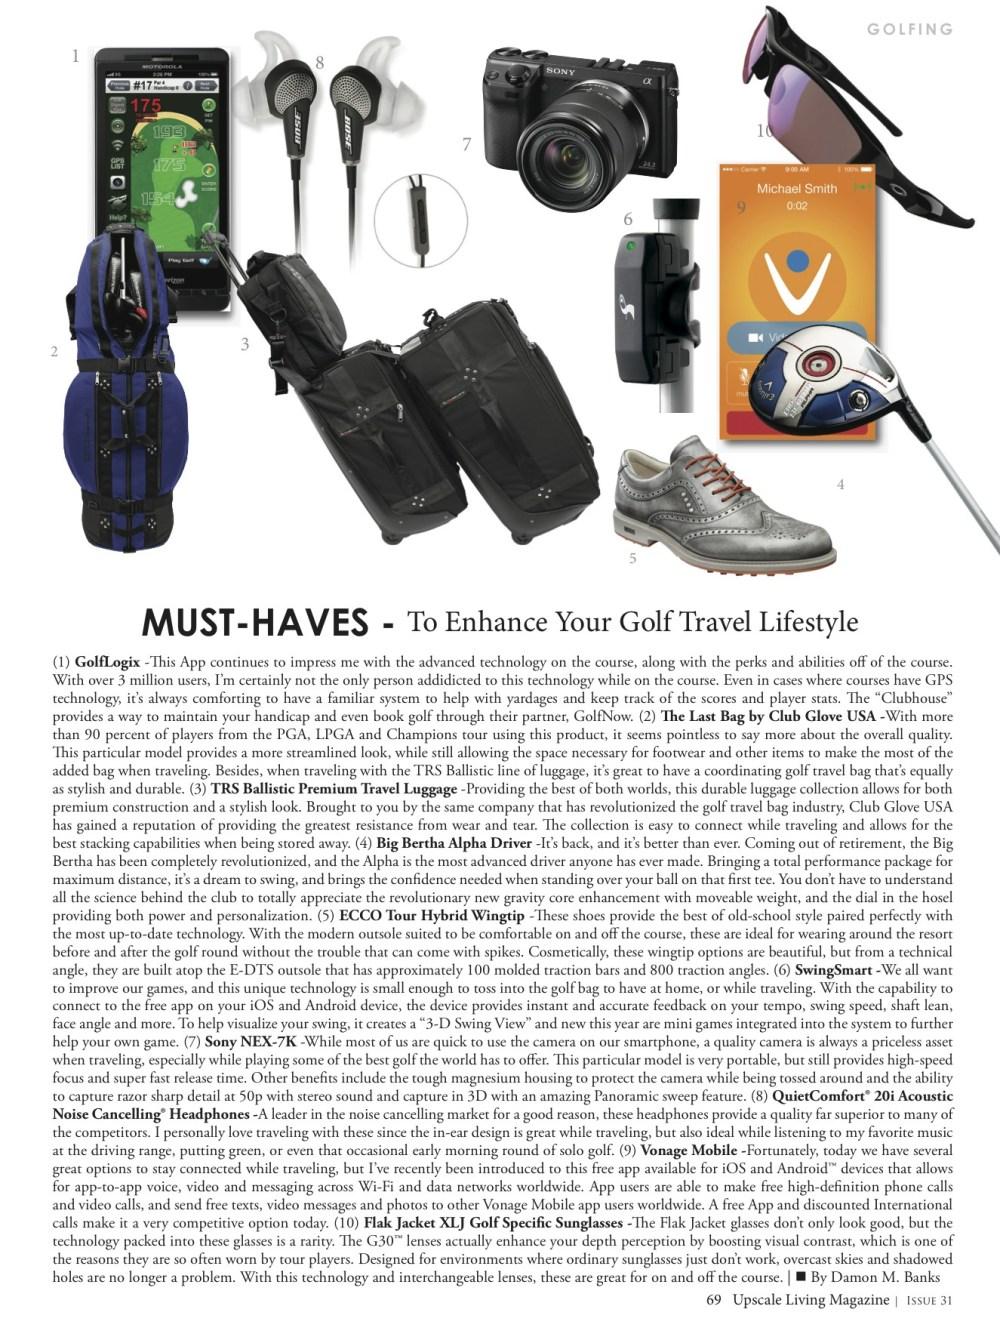 ULM_DamonMBanks_Golf_5